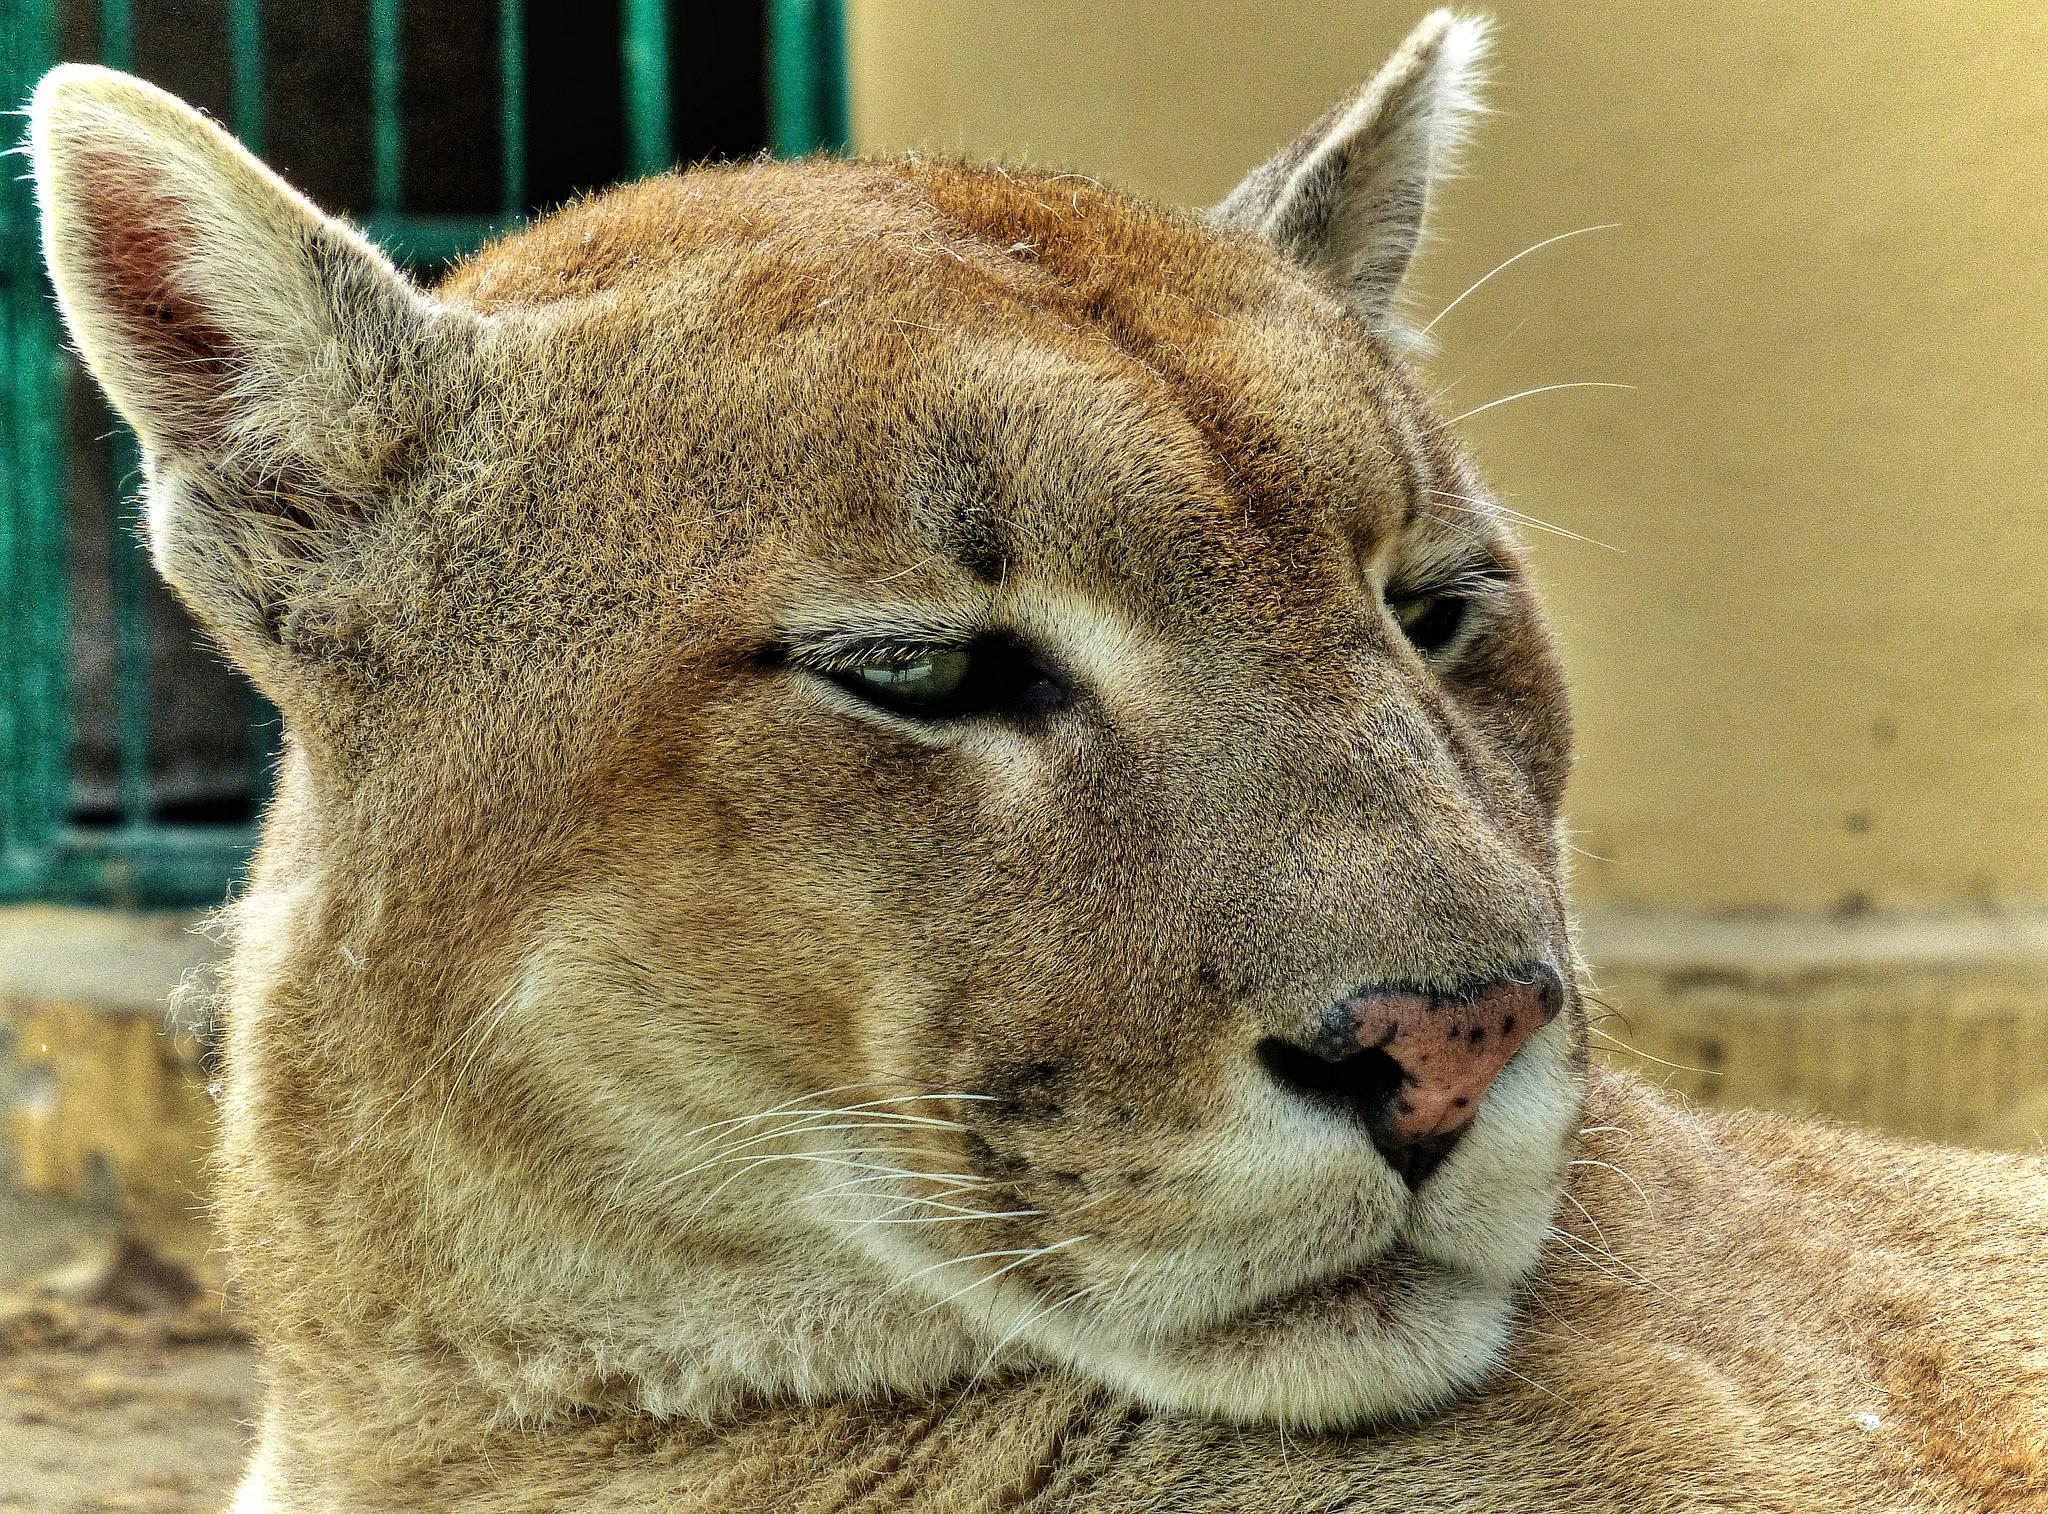 Puma vZOO Spišská Nová Ves, Zdroj: Flickr, CC 2.0, Autor: Traveltipy